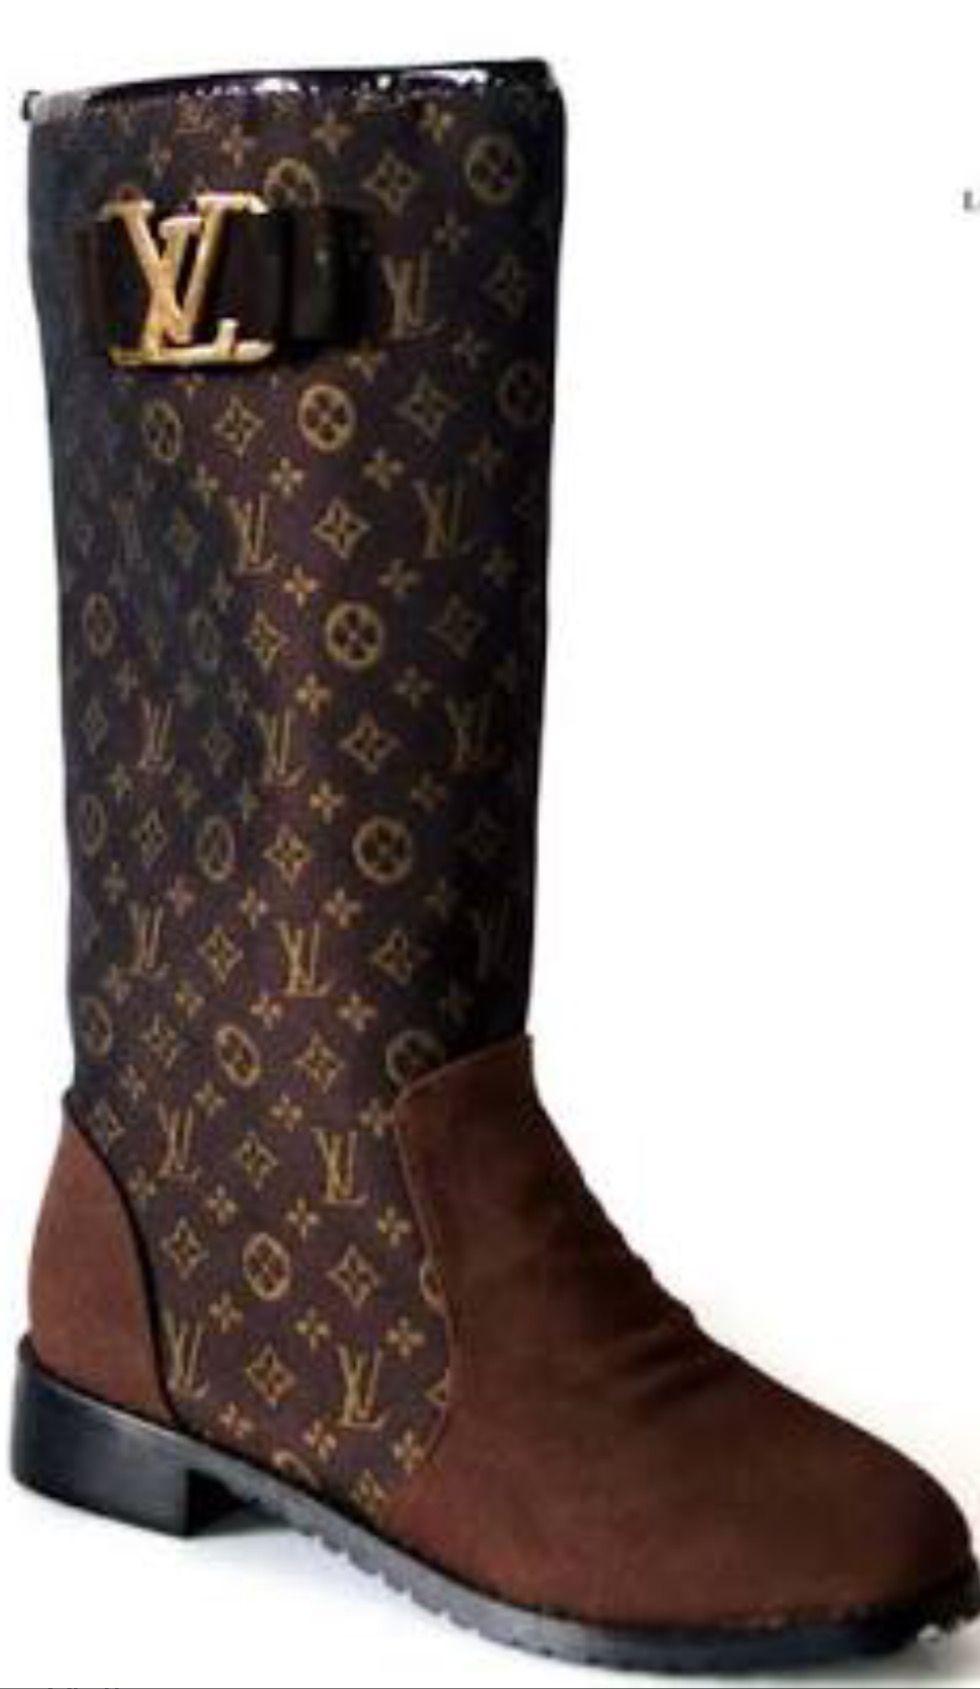 0ace3b82f08 Louis-Vuitton Design  Luxurydotcom via LV